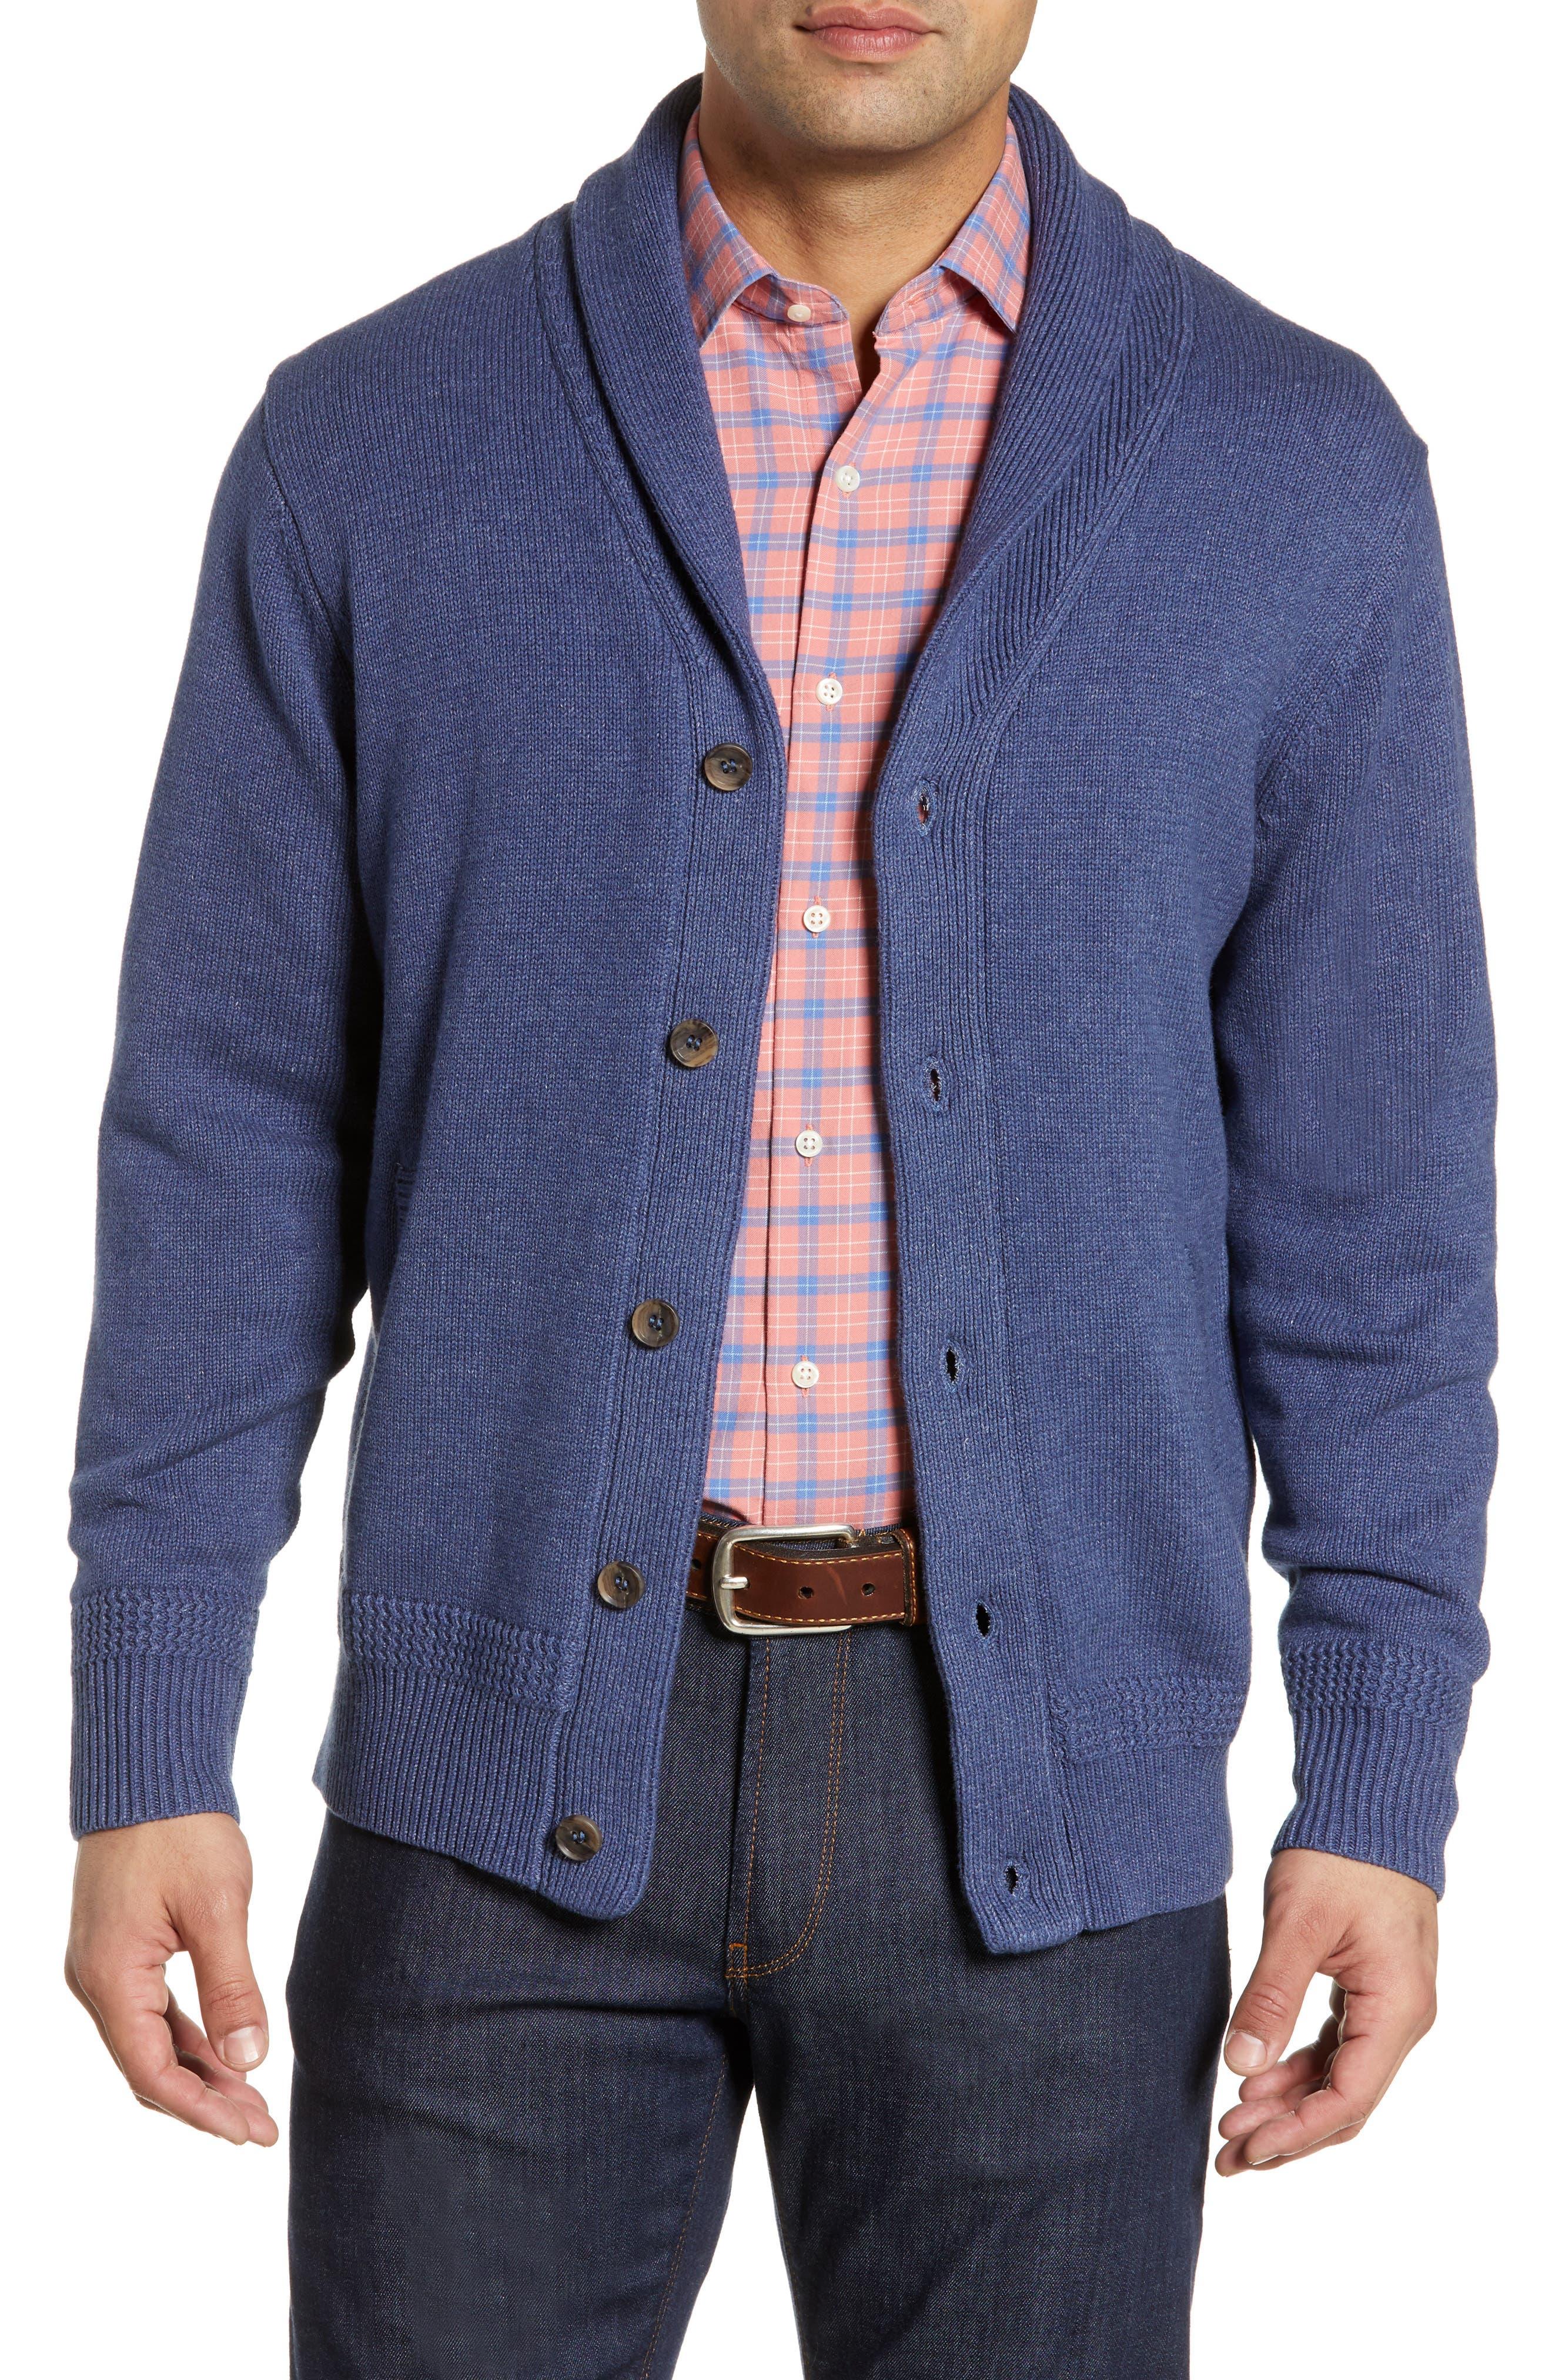 Peter Millar Seaside Shawl Collar Cardigan, Blue